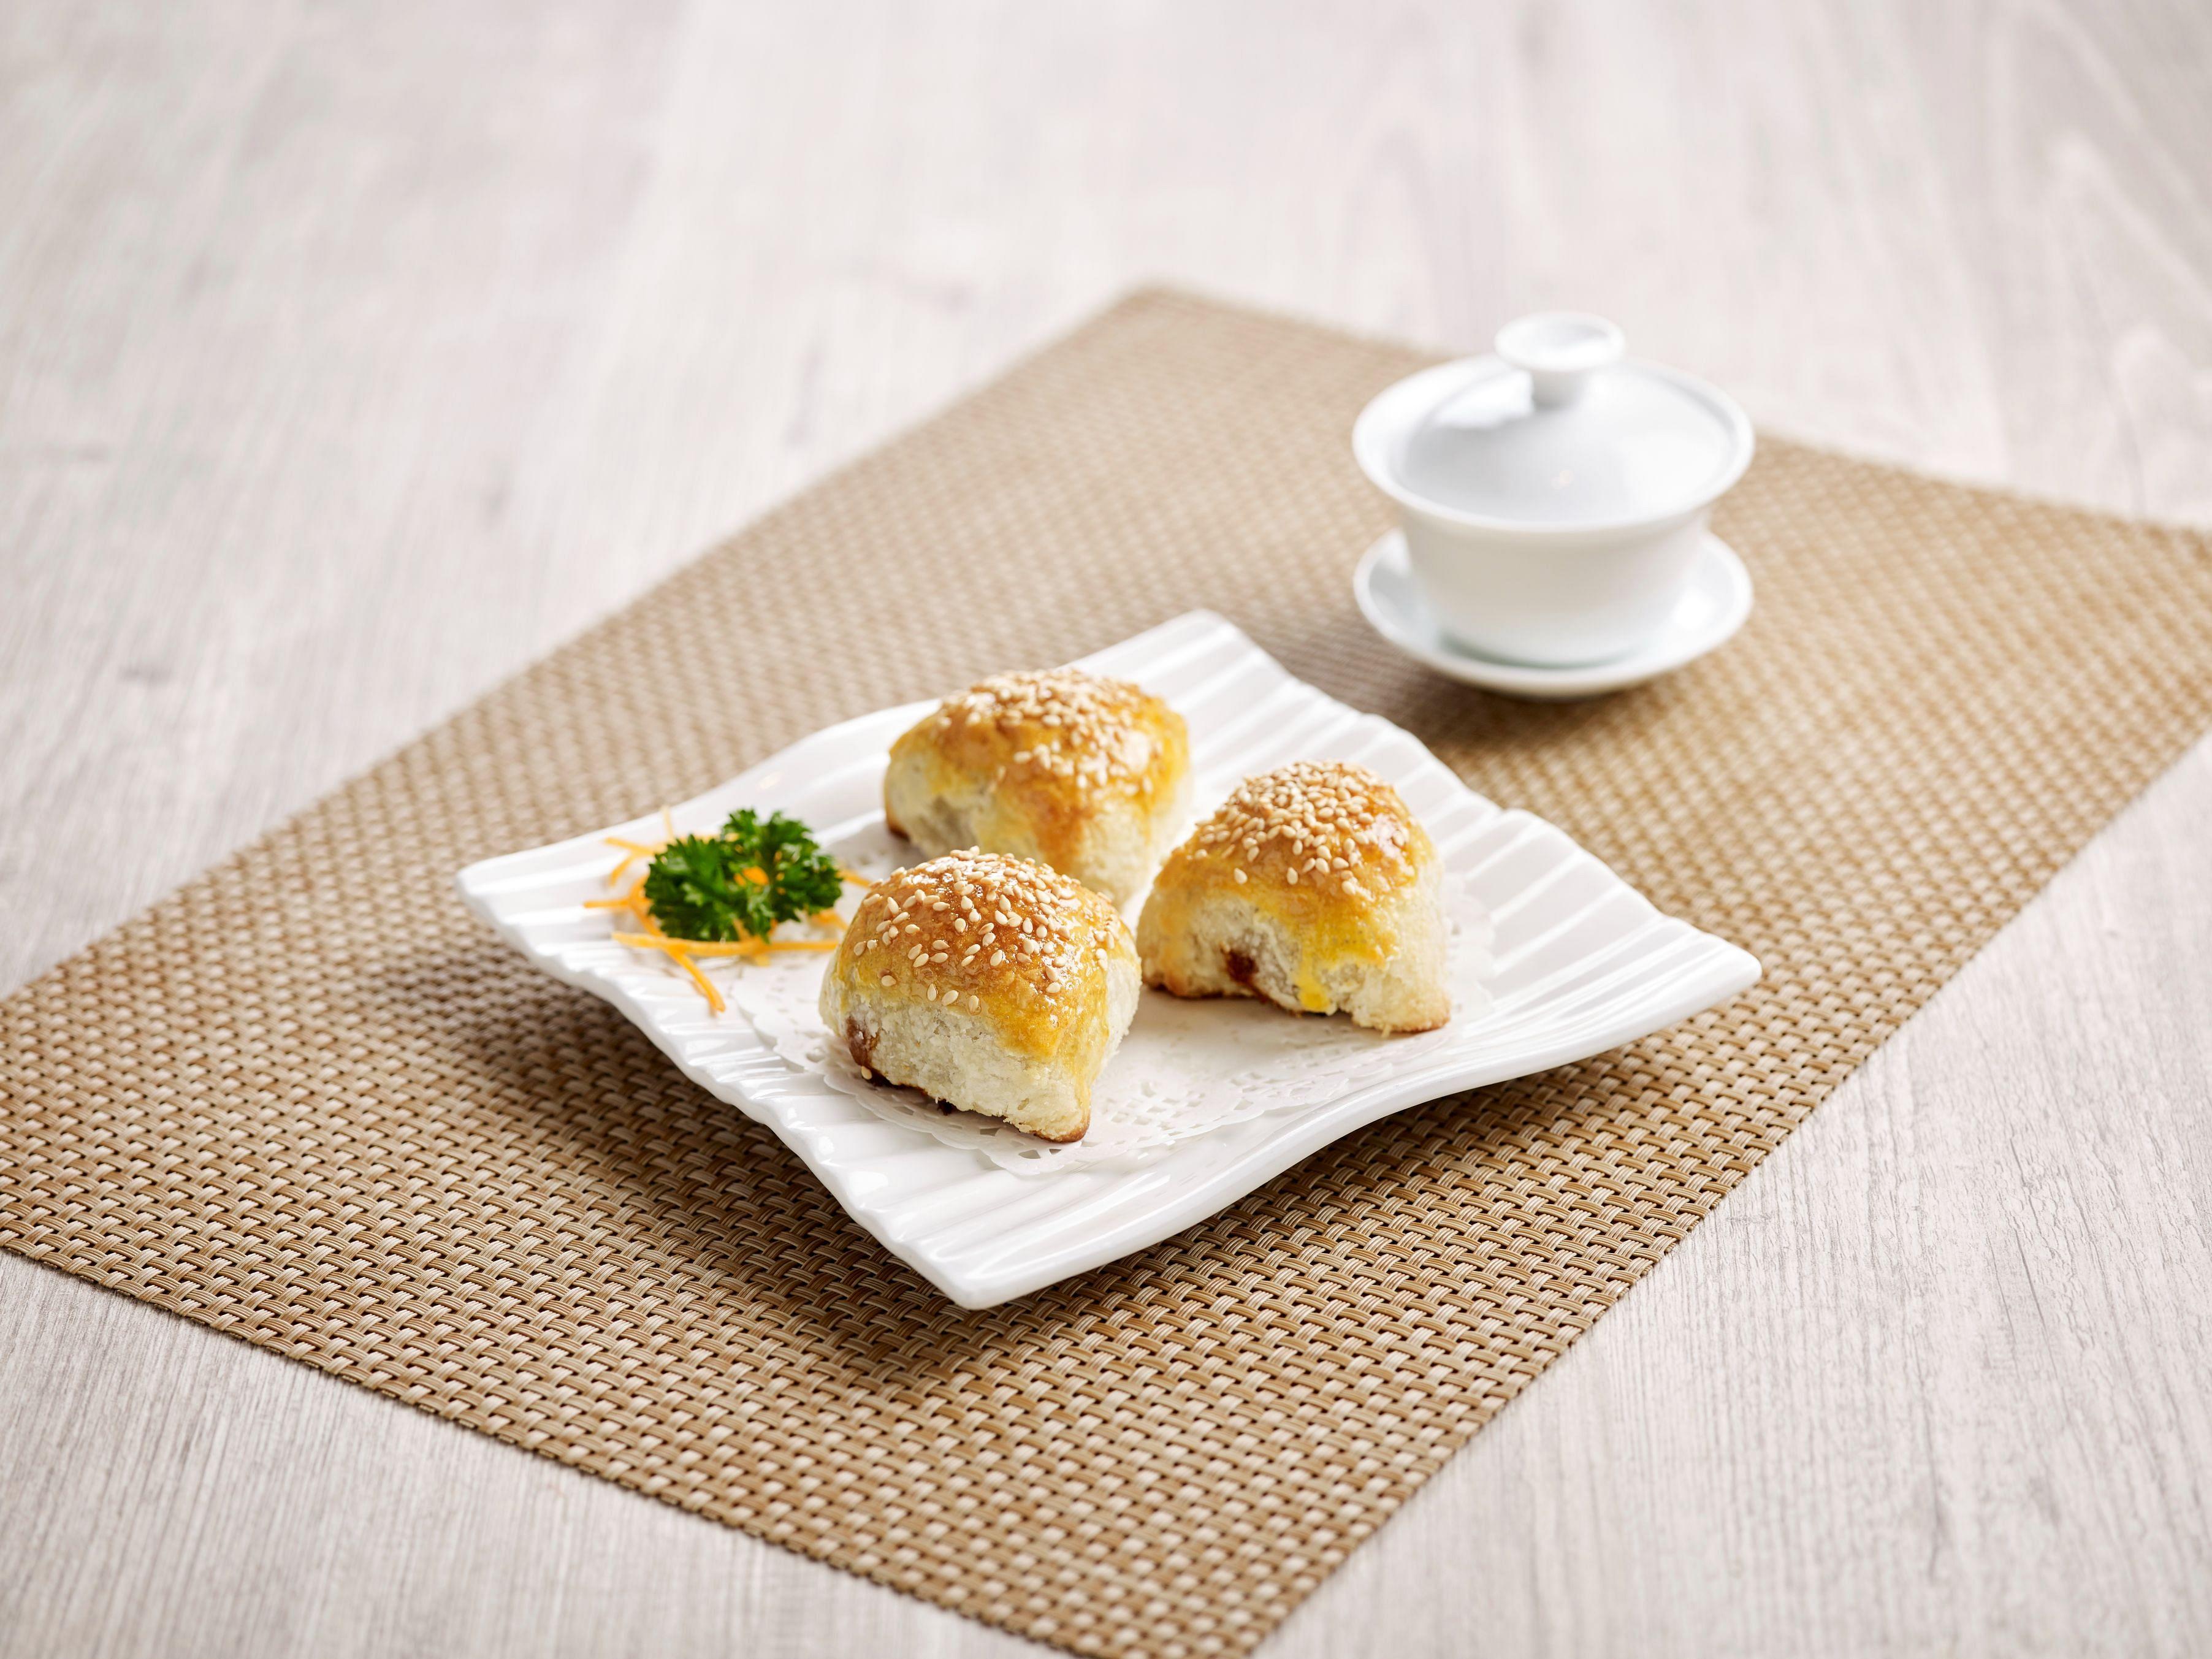 paradise teochew, baked bbq honey pork pastry